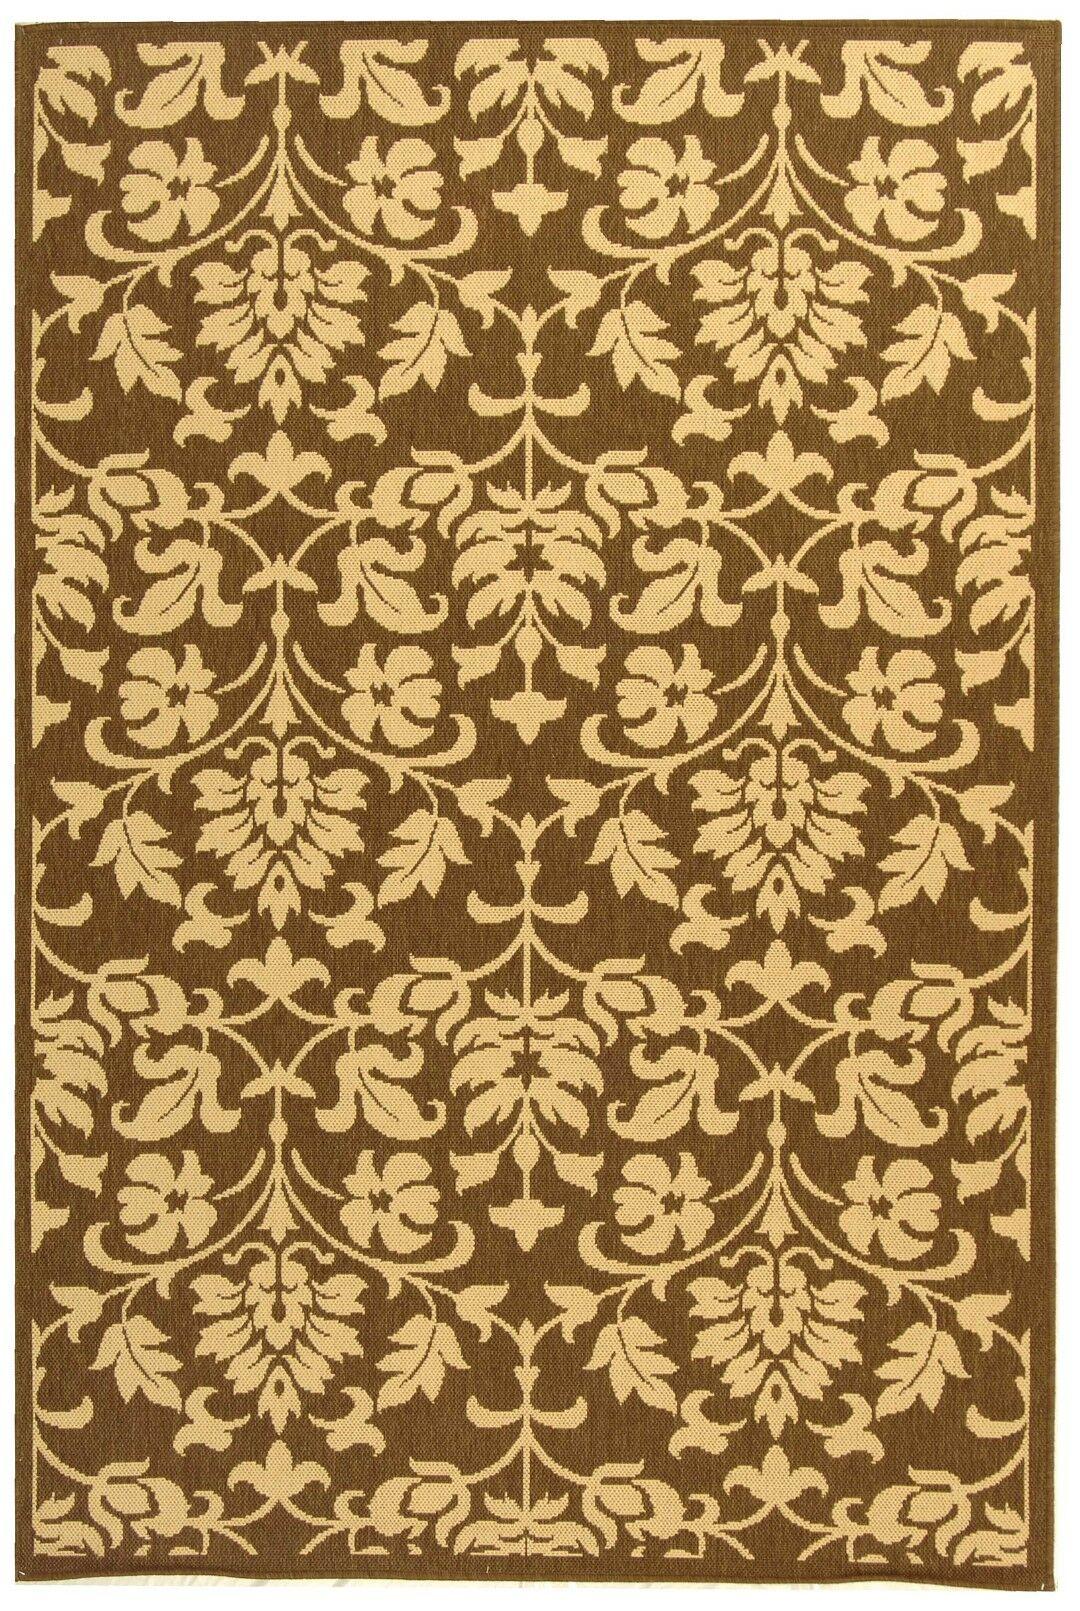 Beasley Brown/Natural Indoor/Outdoor Area Rug Rug Size: Rectangle 8' x 11'